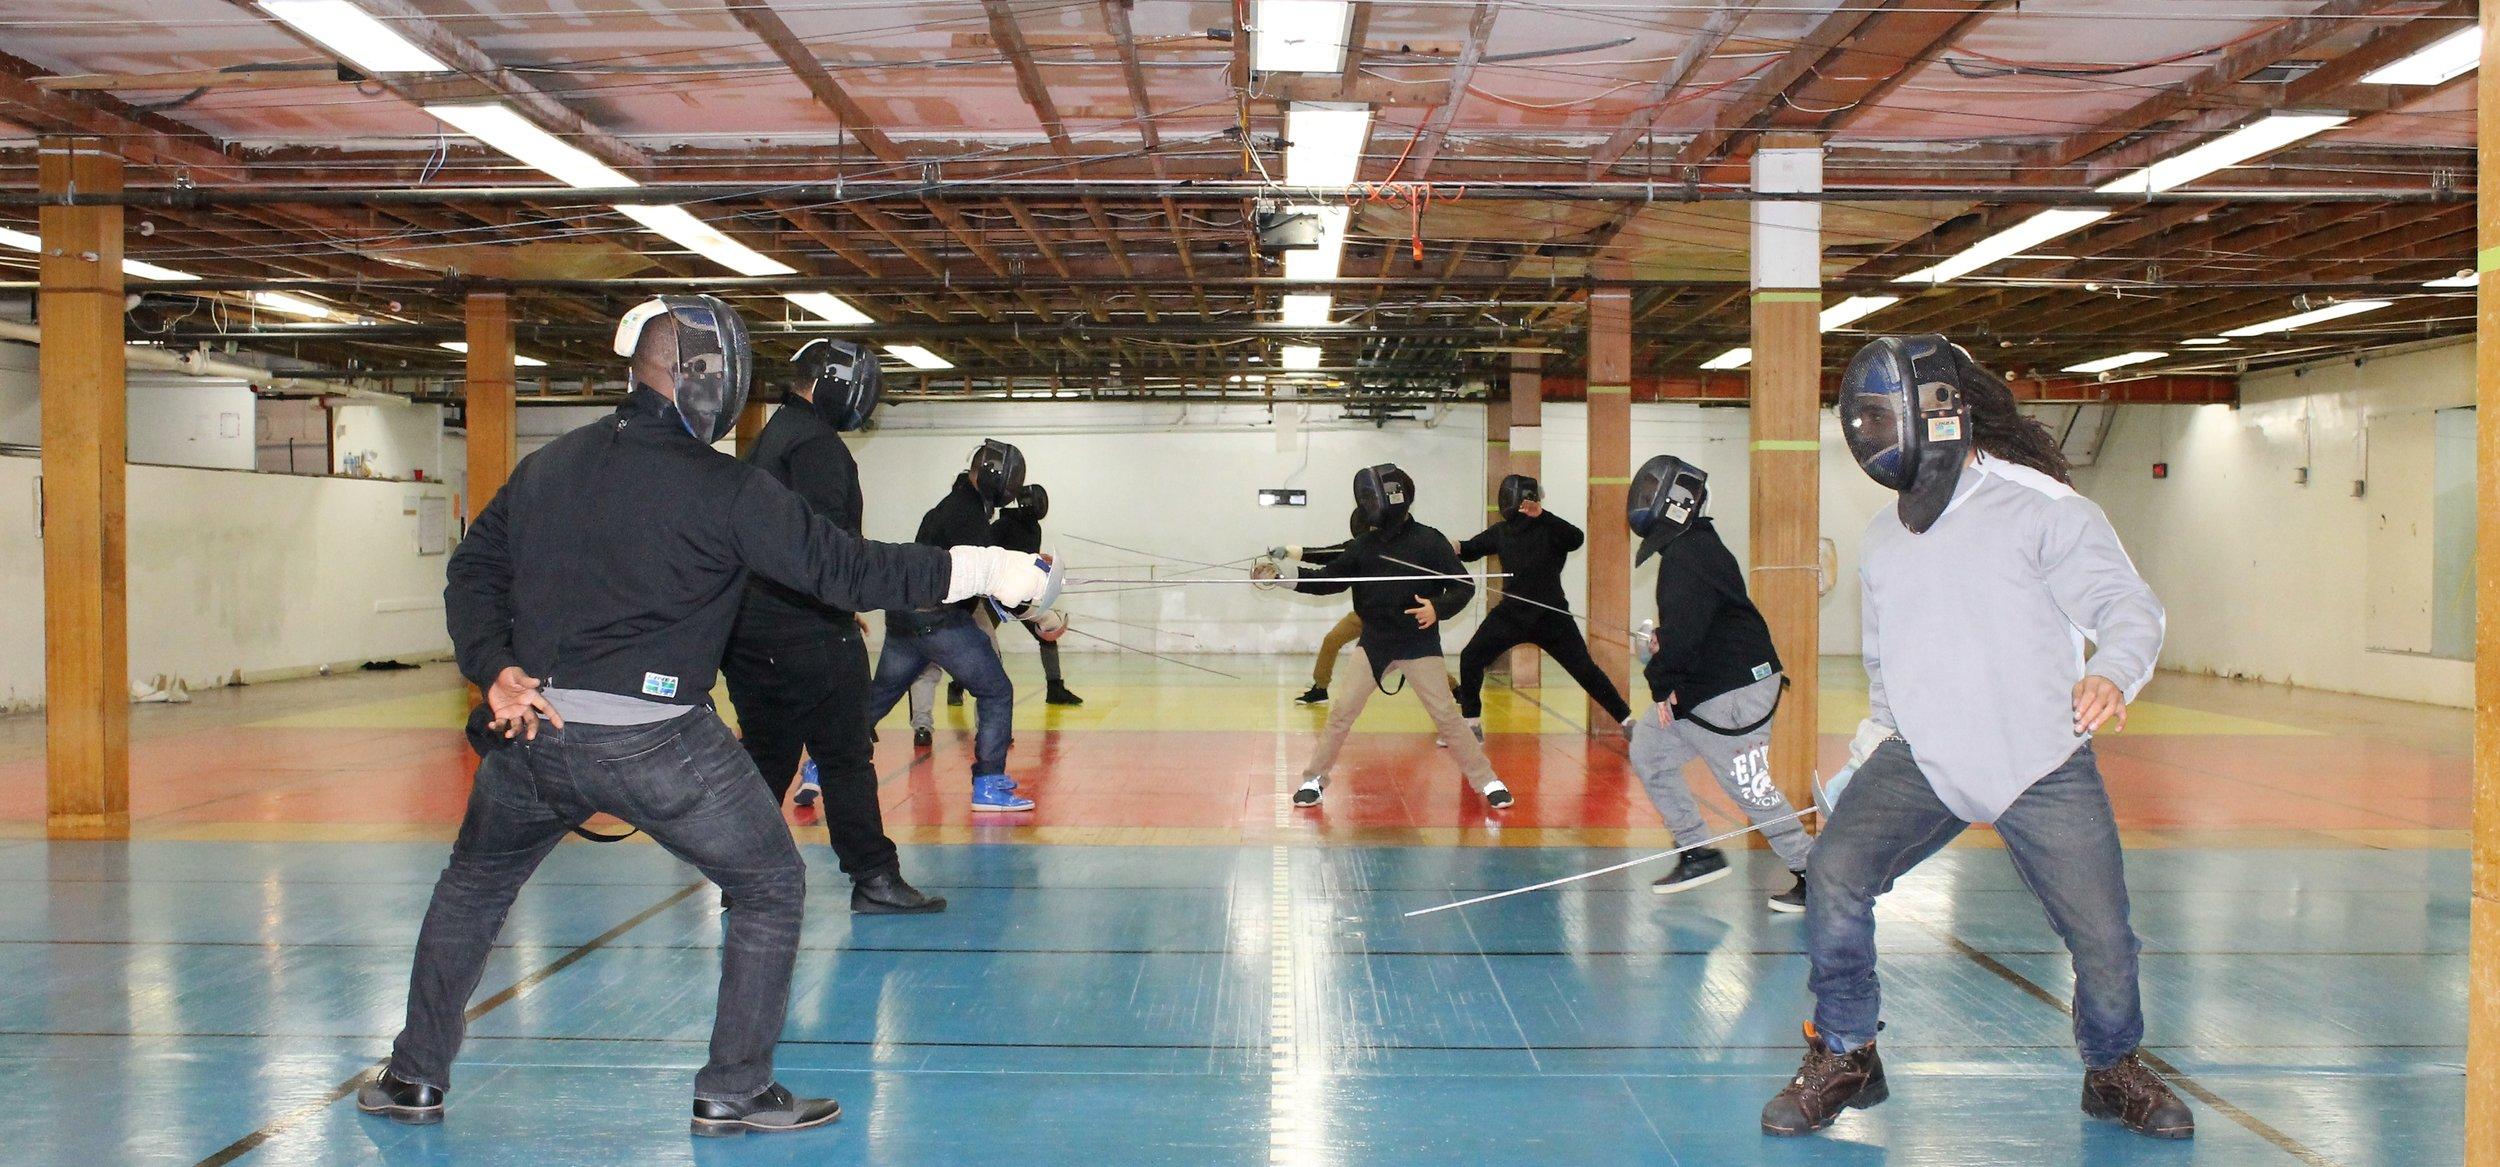 New Lens Urban Mentoring Society with Minnesota Swords Club Fencing #NewLensSociety 09.JPG